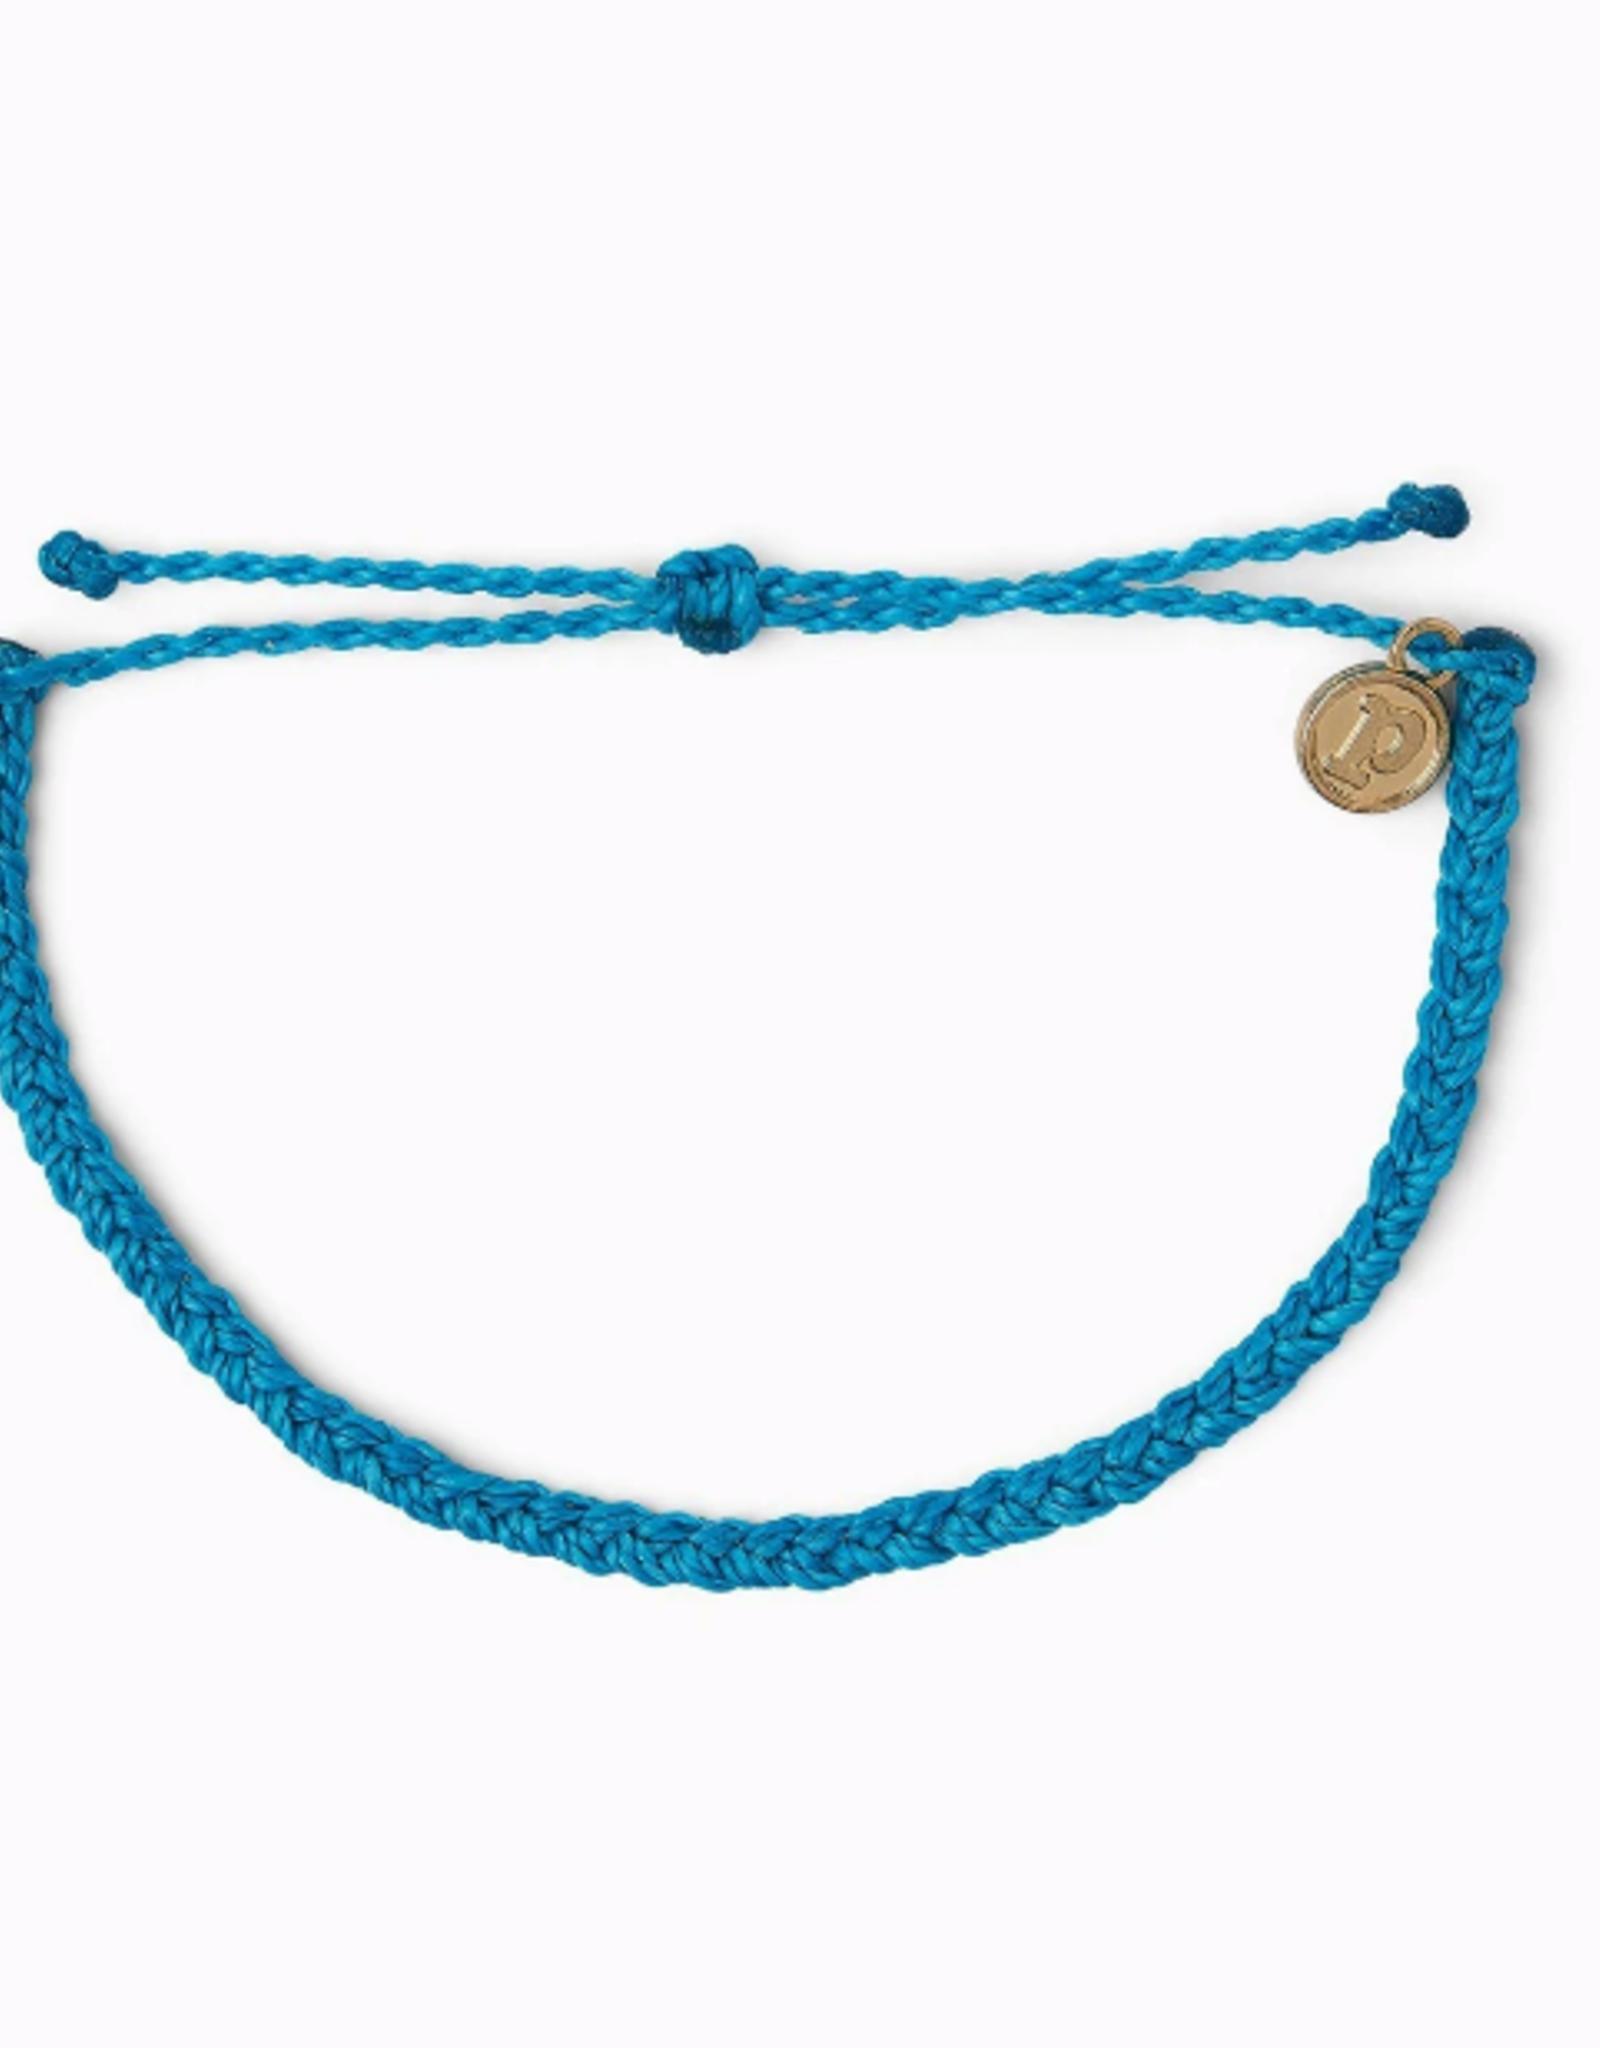 Puravida Puravida - Mini Braided Neon Blue Bracelet